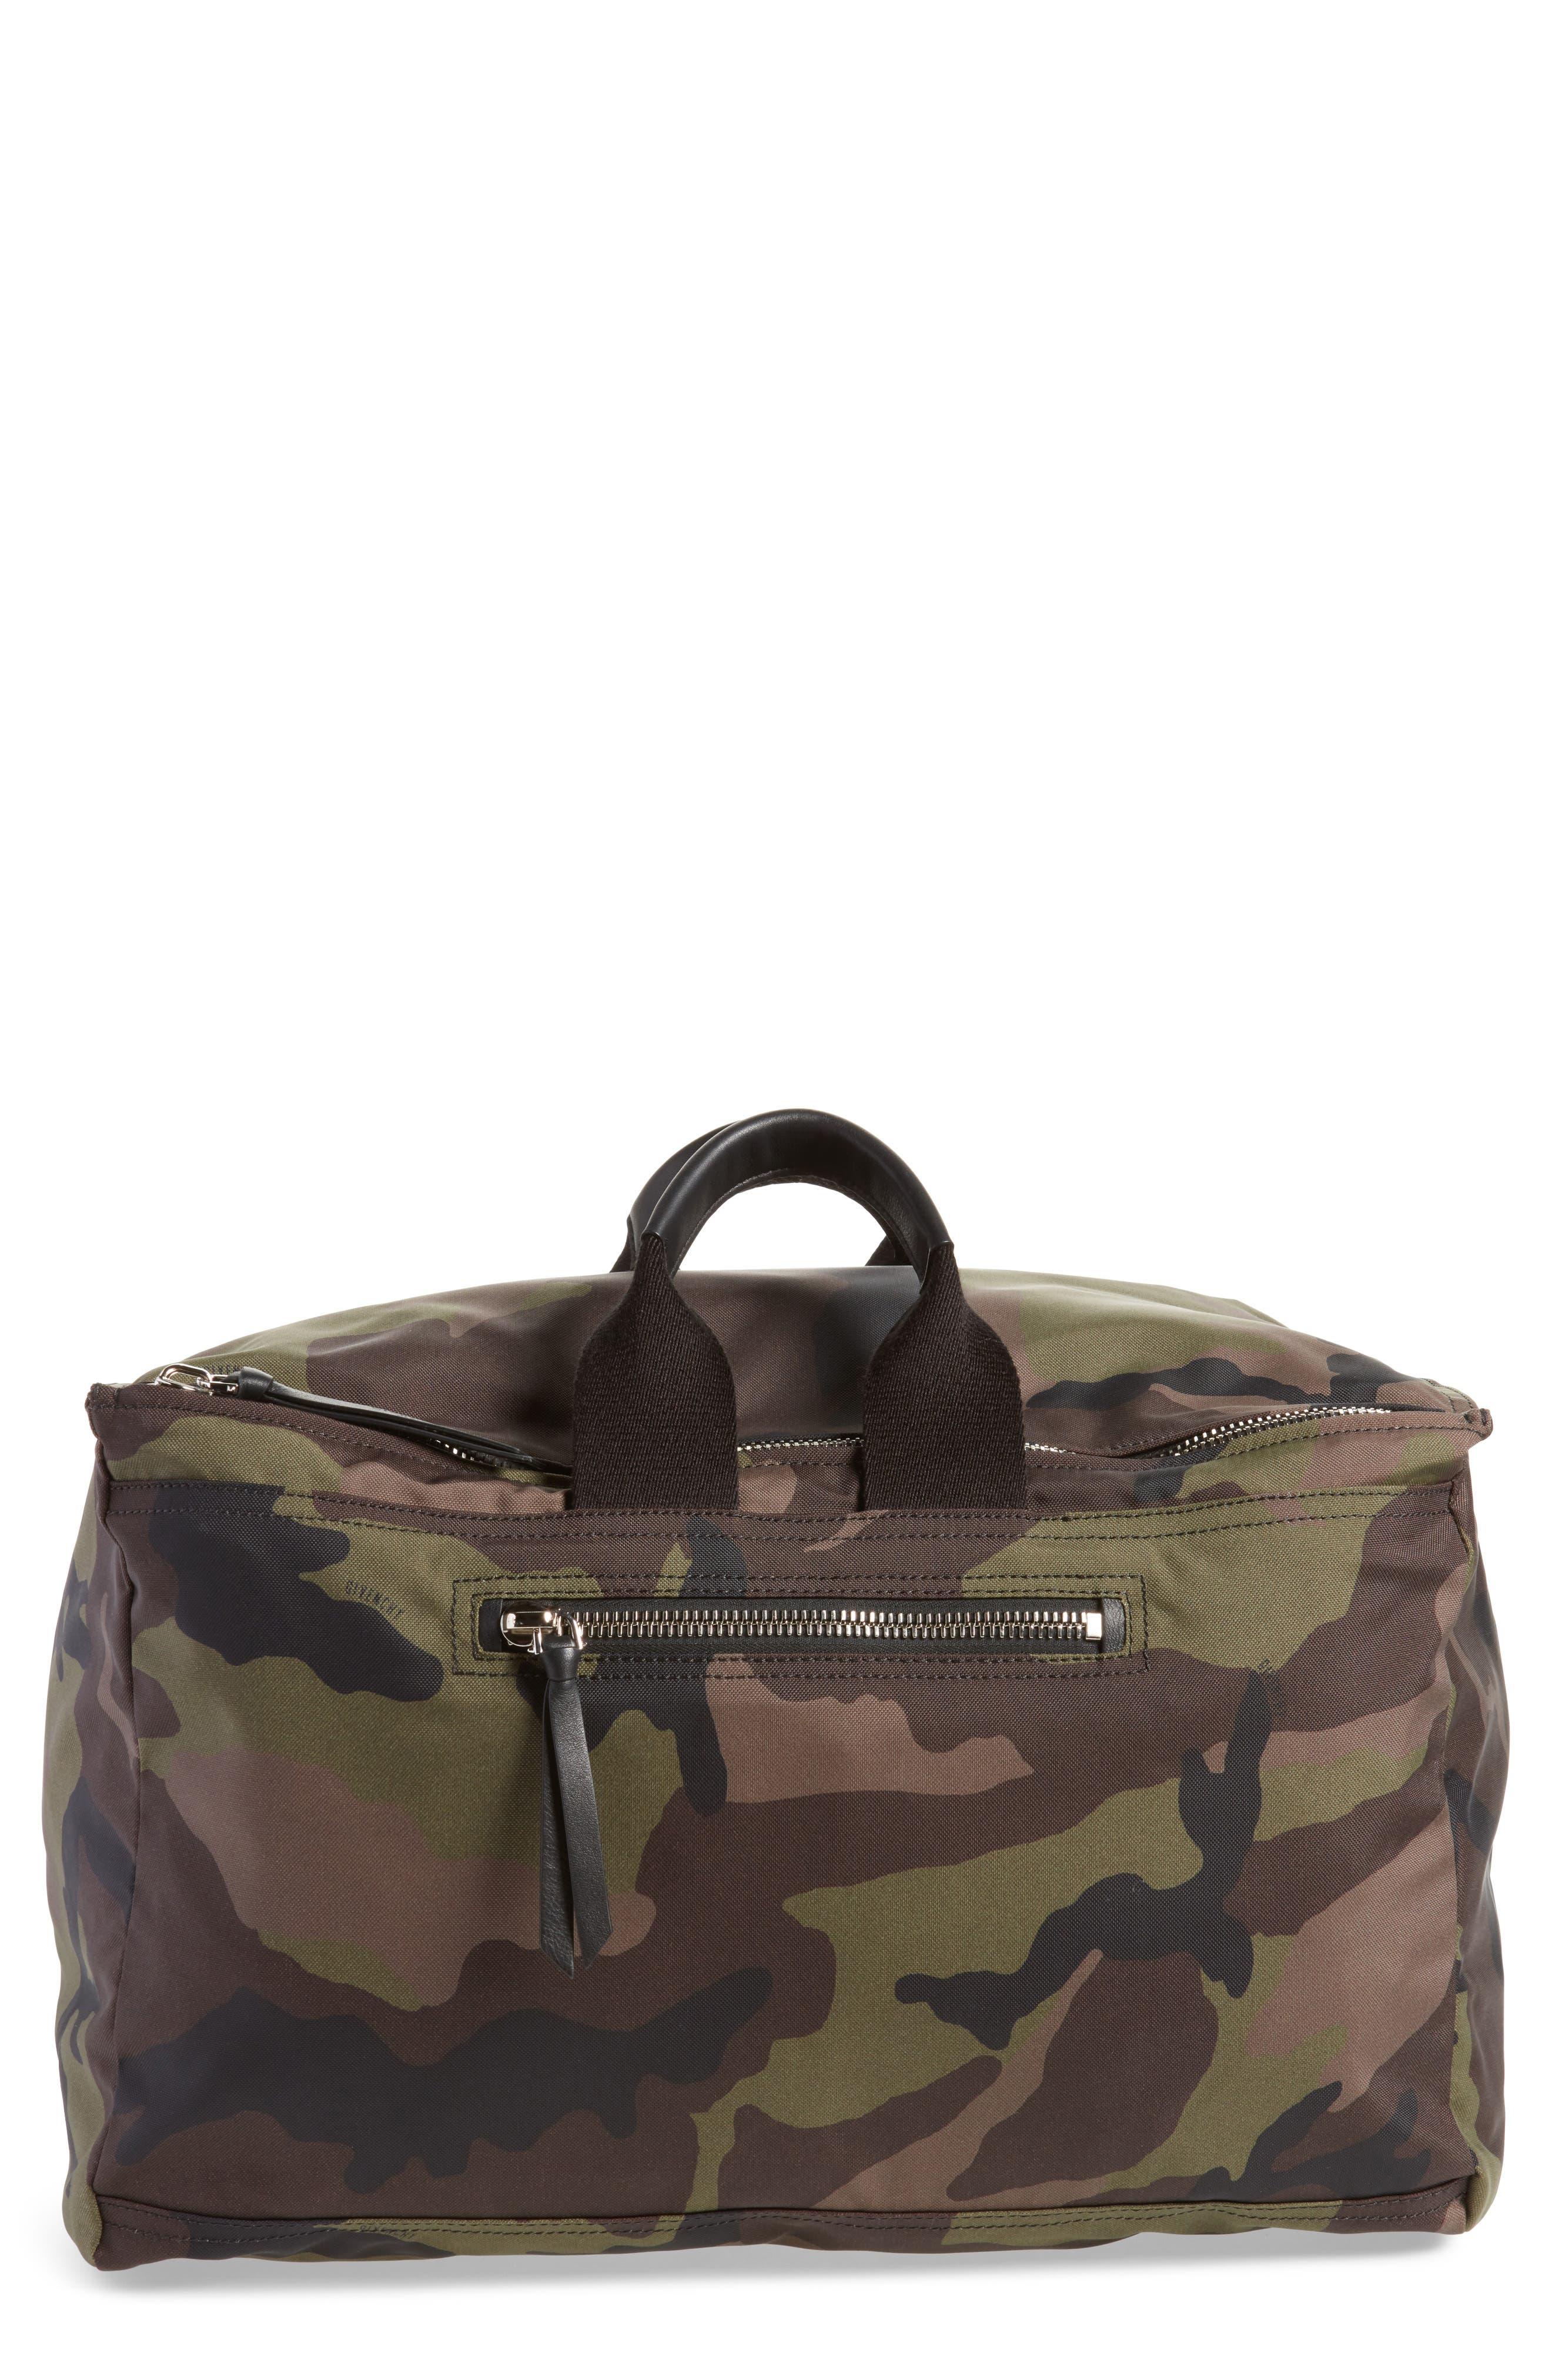 Pandora Camo Convertible Backpack,                         Main,                         color, Multicolored